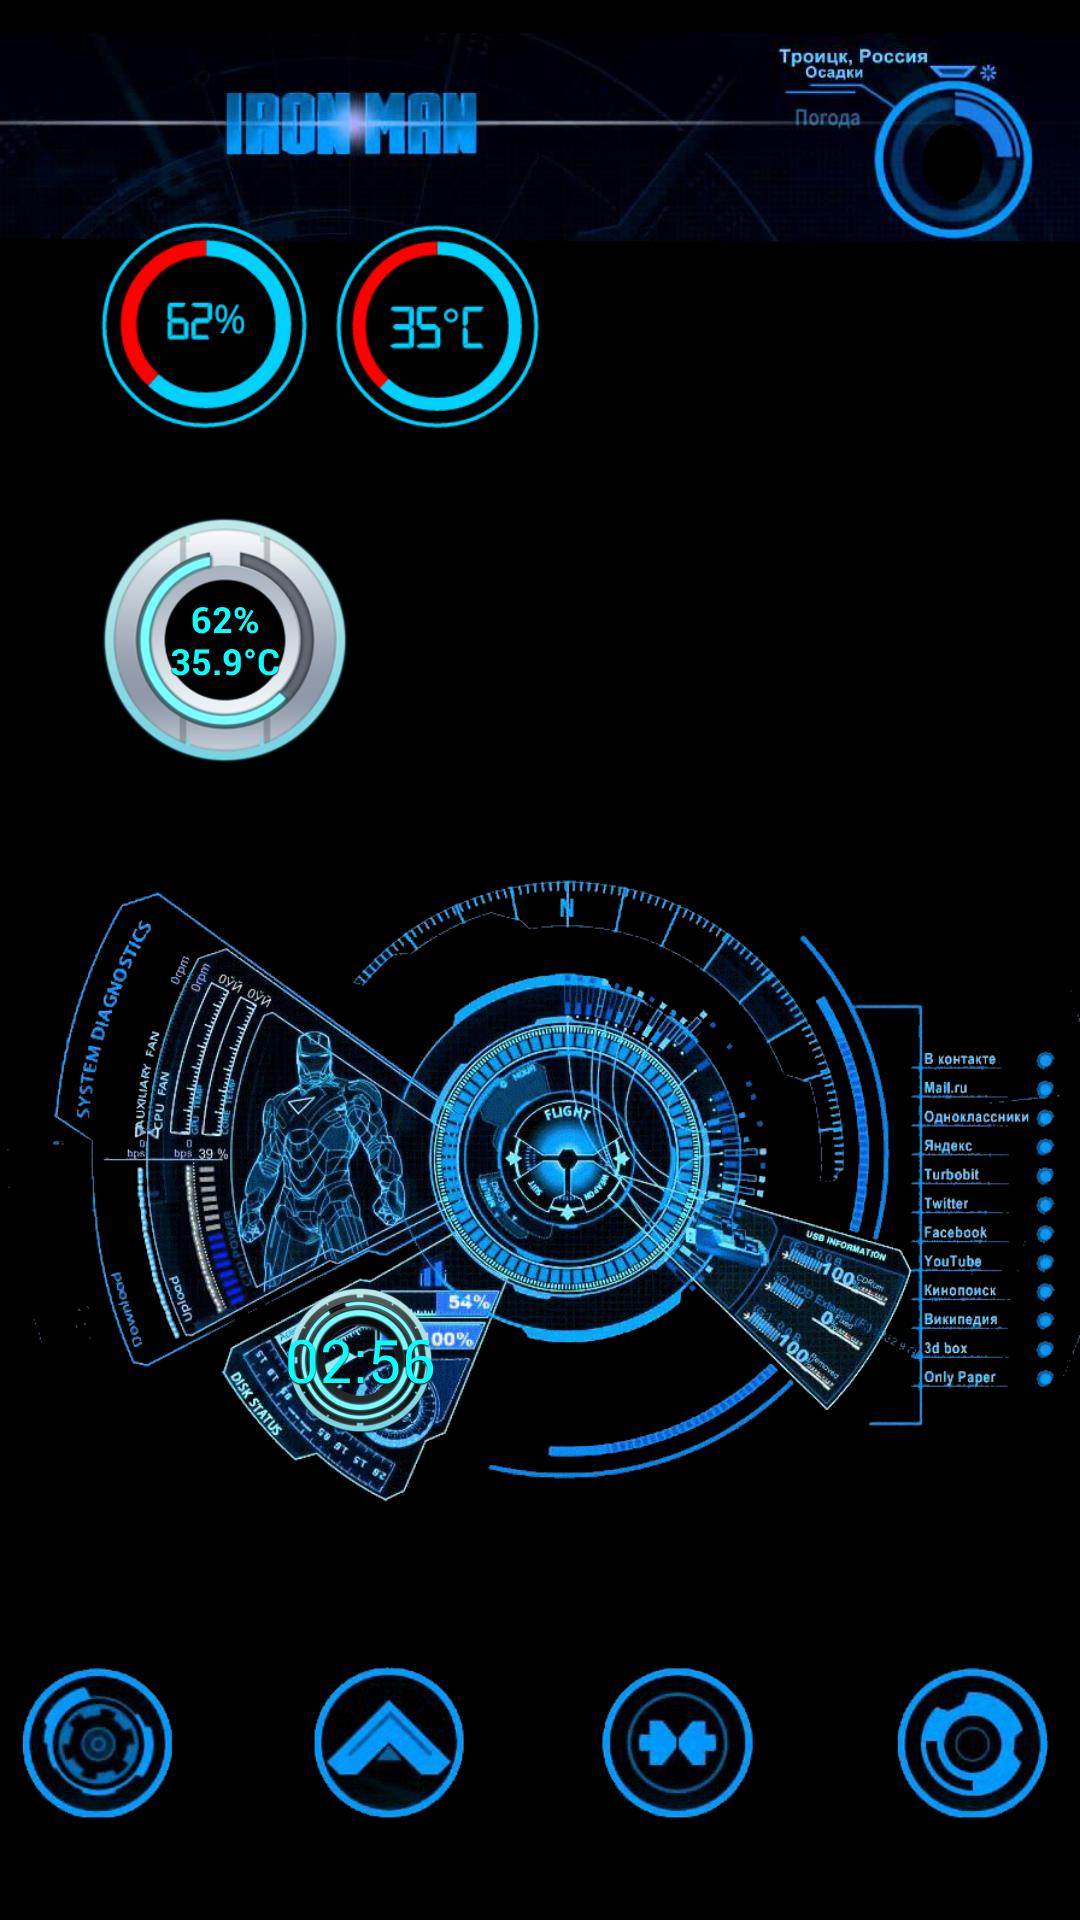 Wallpaper featuring an animated 3D MODEL of IRON MAN a TALKING JAR 1080x1920